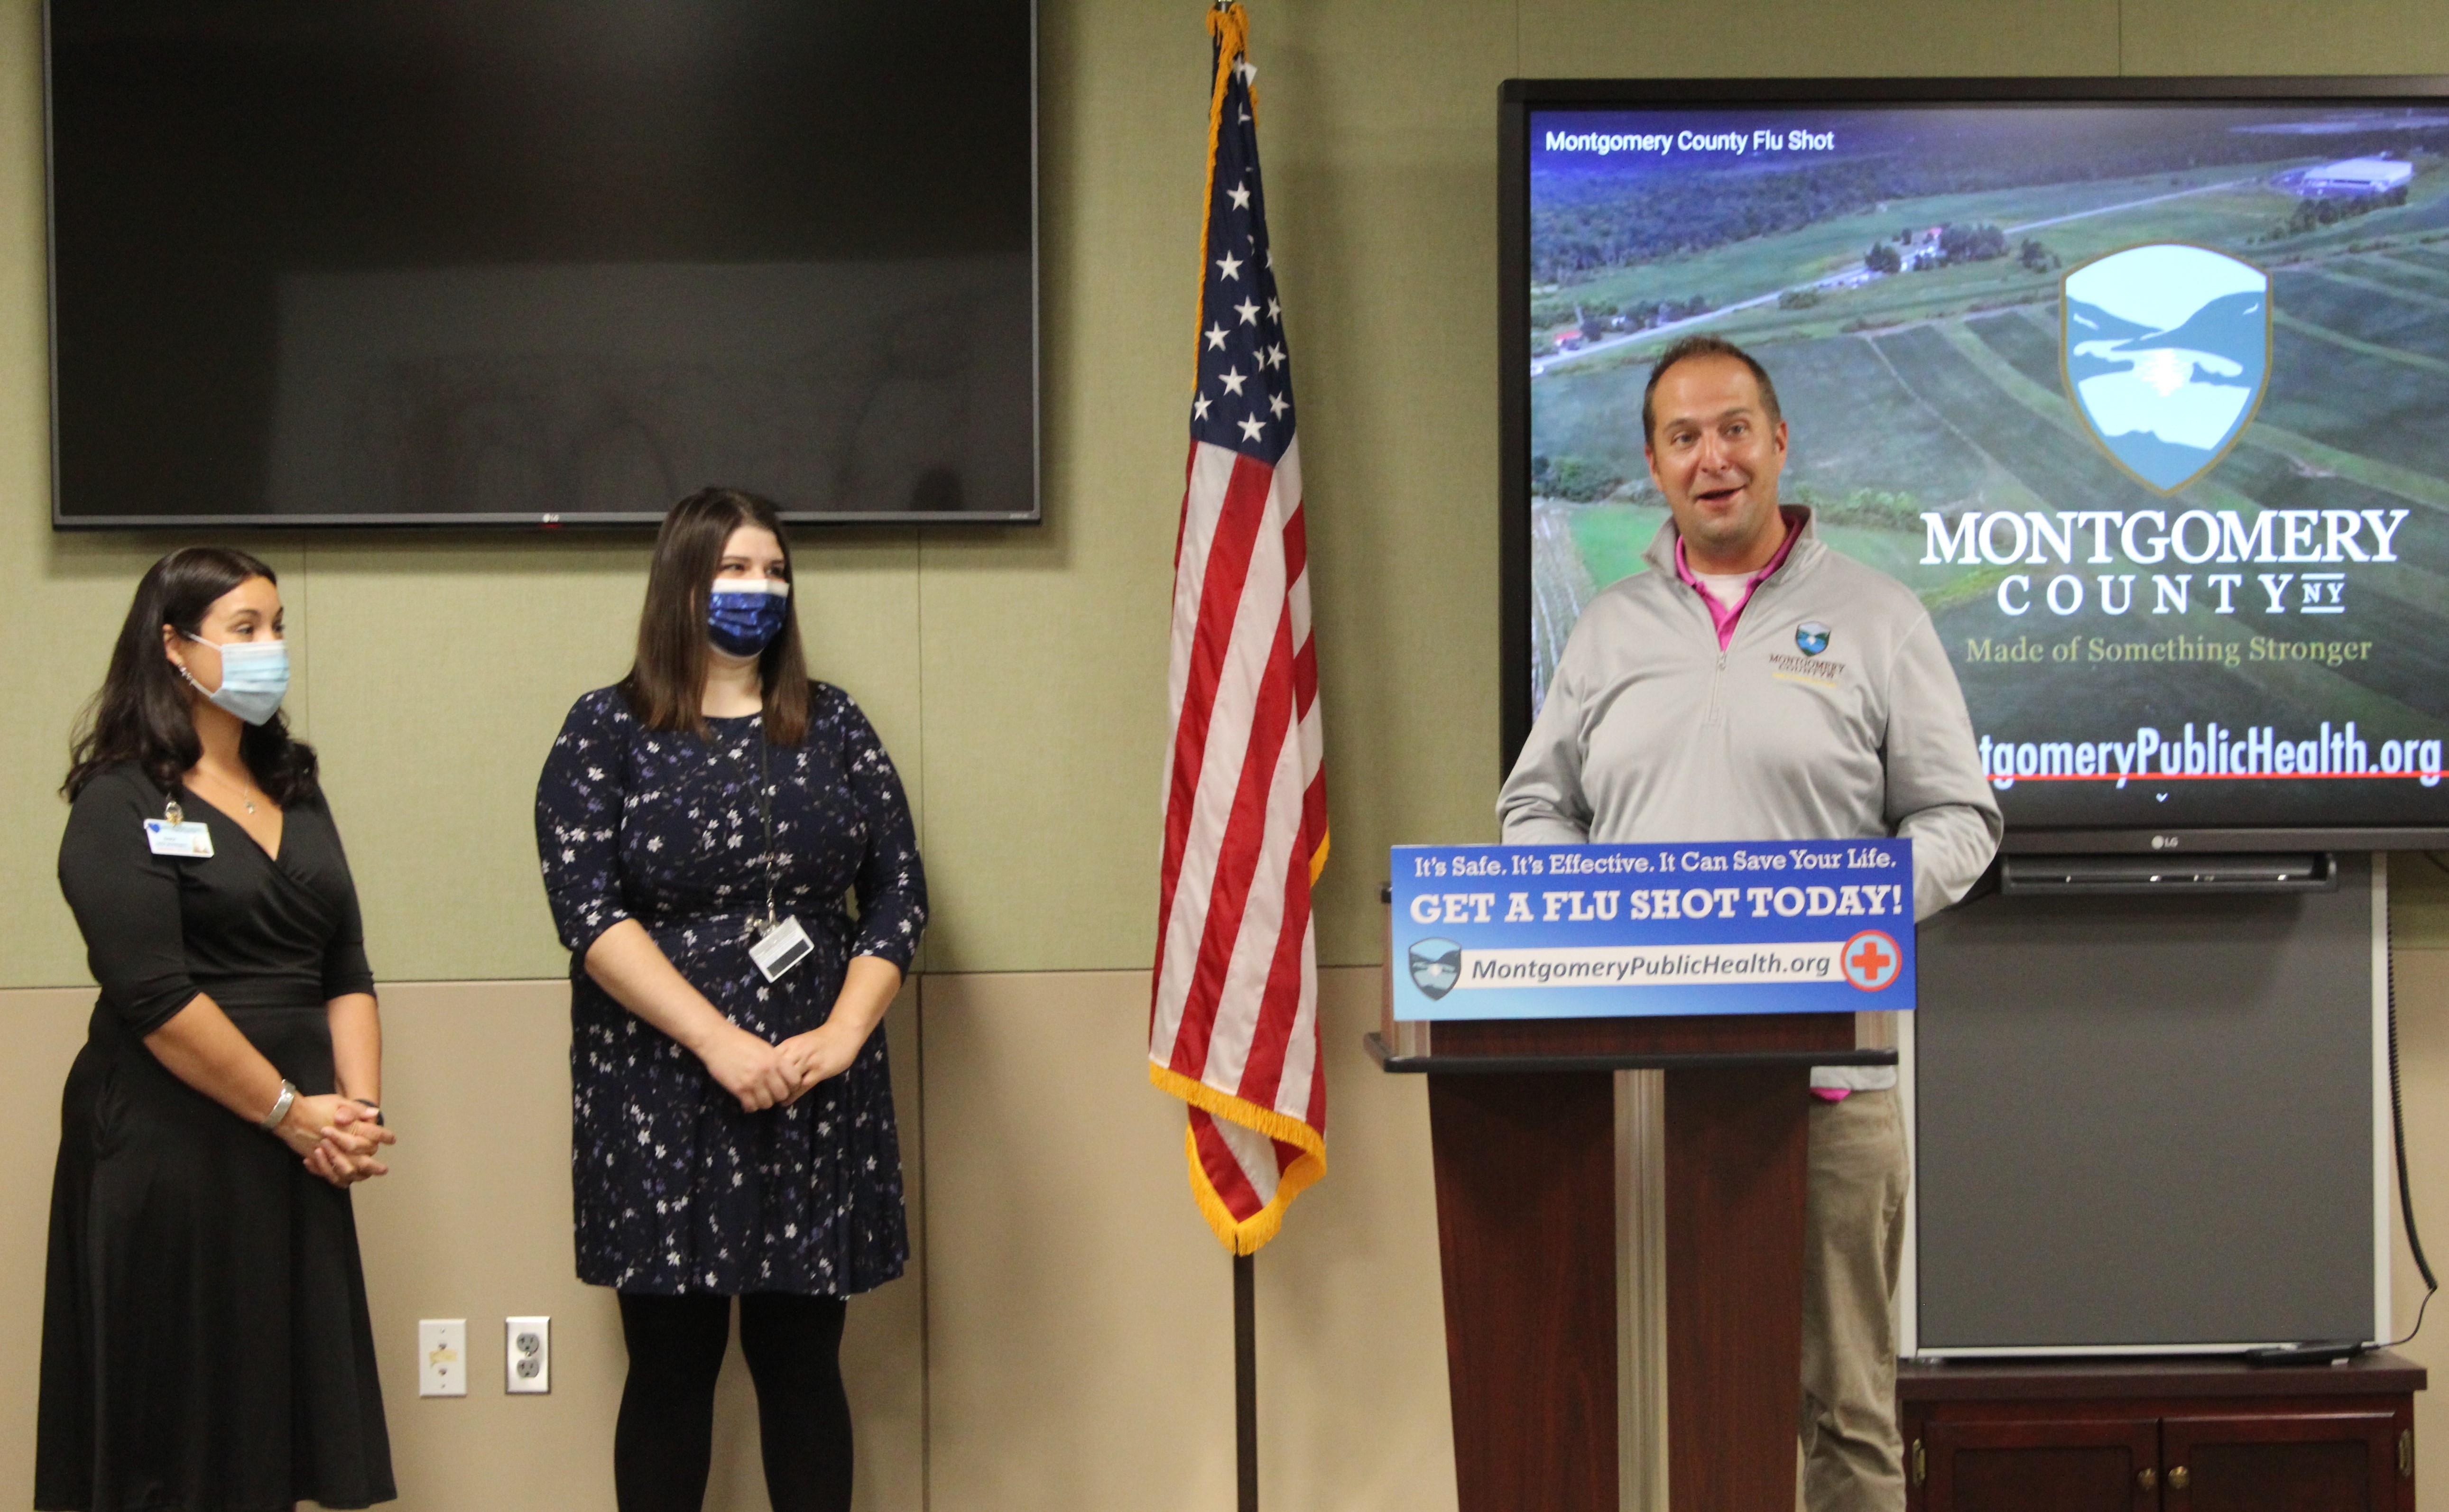 Montgomery County Executive Matt Ossenfort